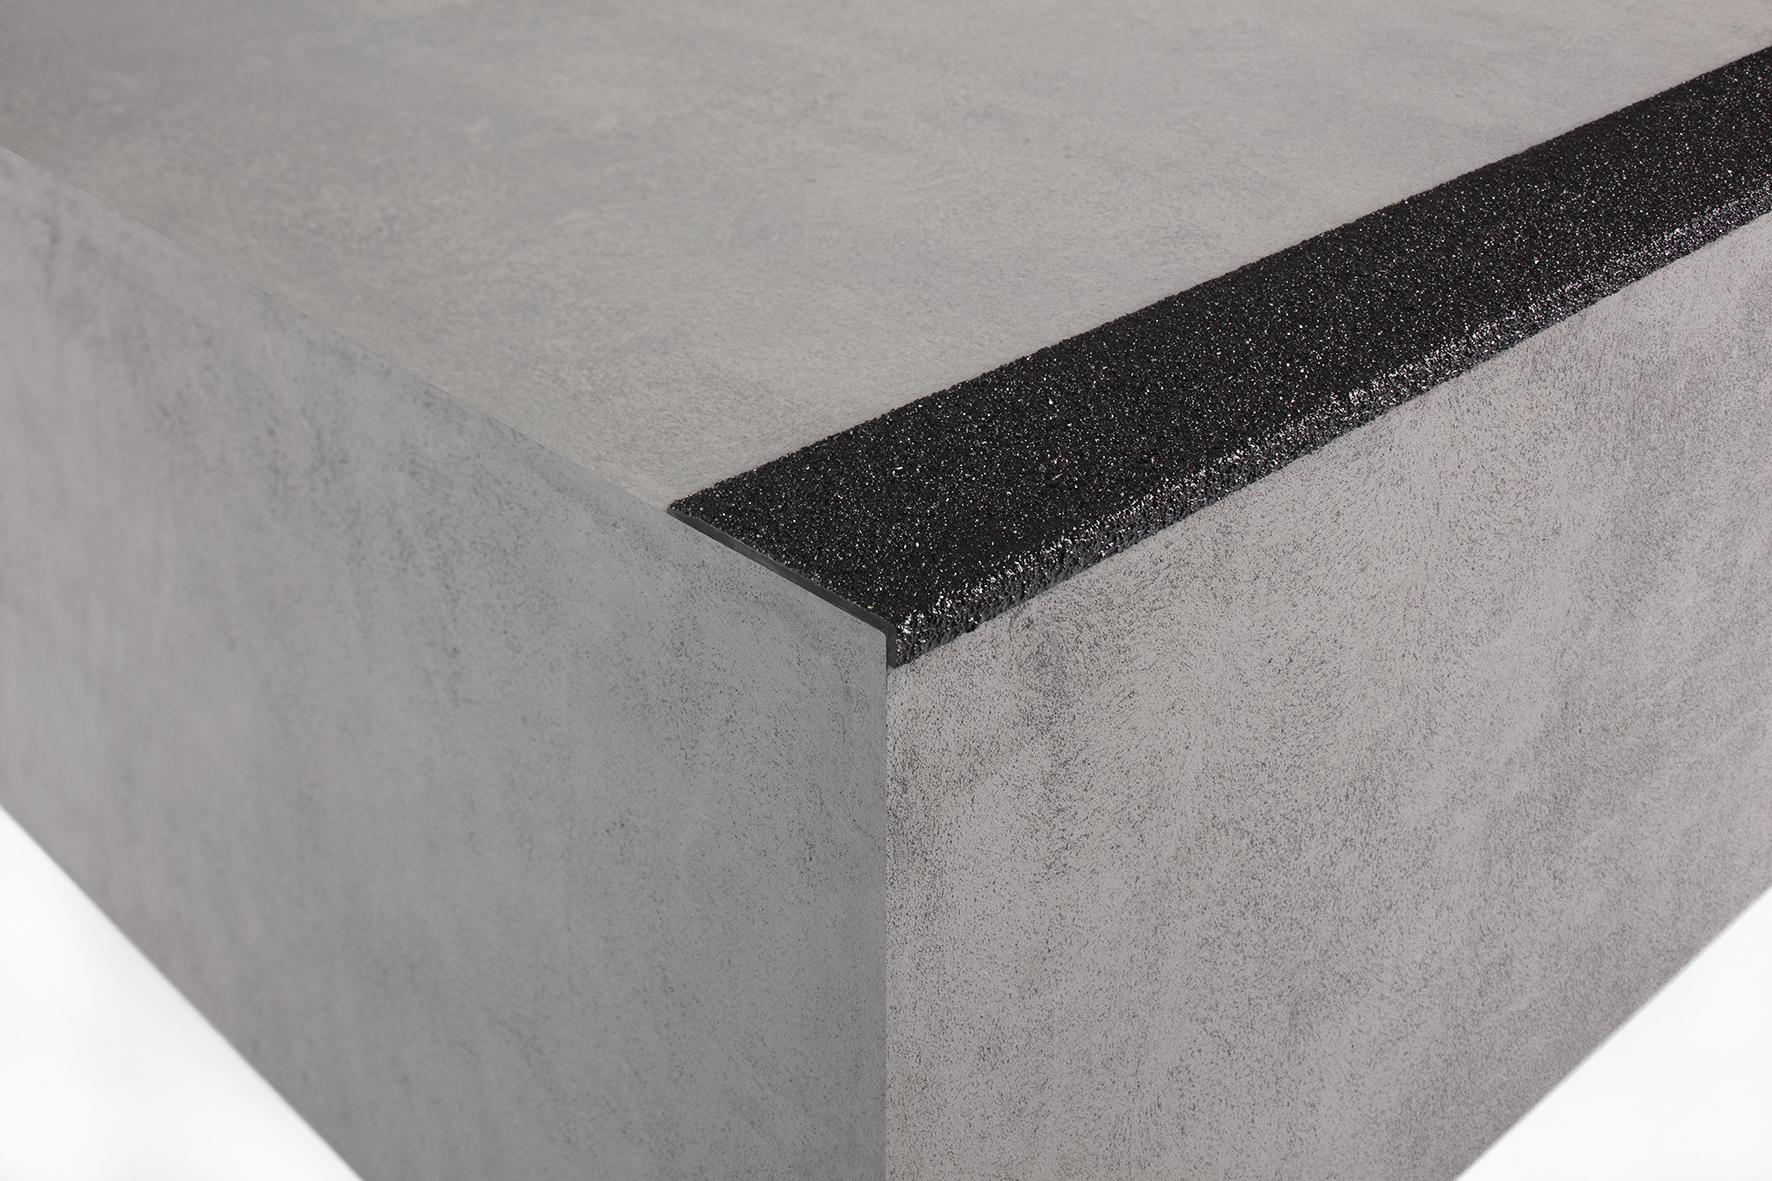 Carborundum Heavy Duty Anti Slip Stair Nosing